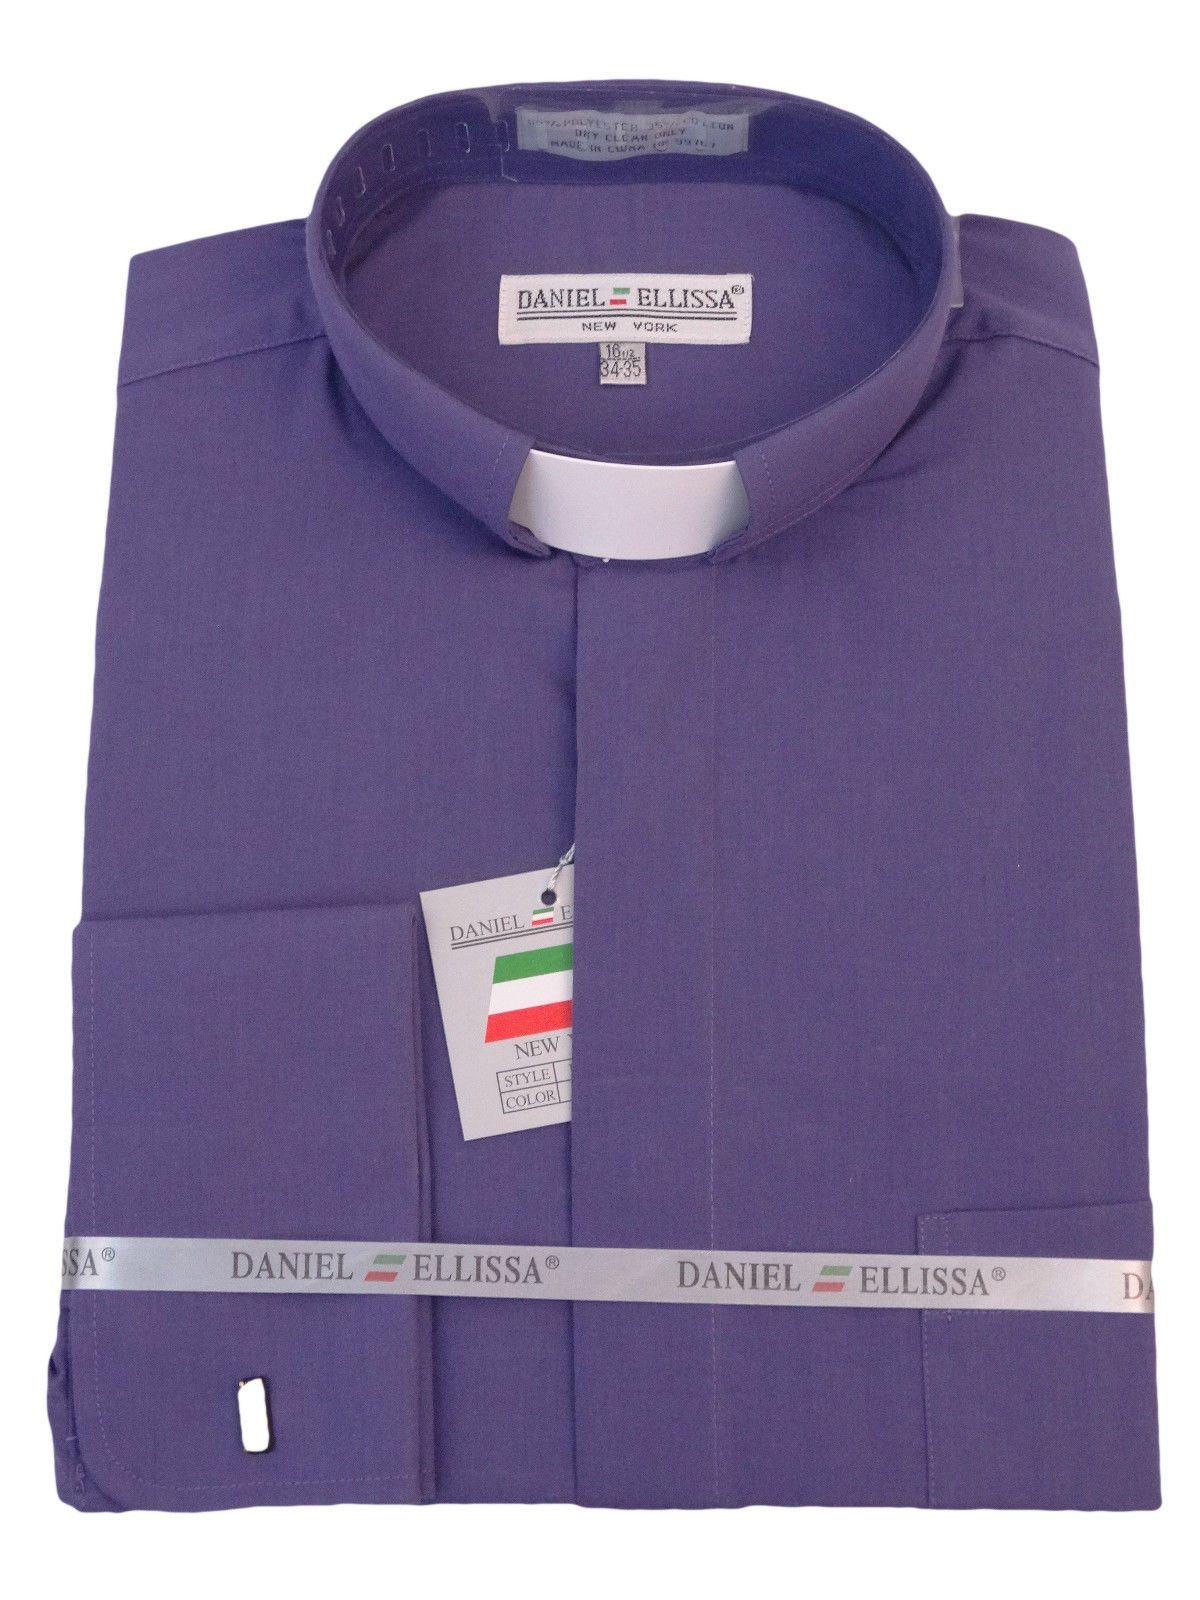 Mens Clergy Tab Collar Long Sleeve Dress Shirt Purple Frenchcuff